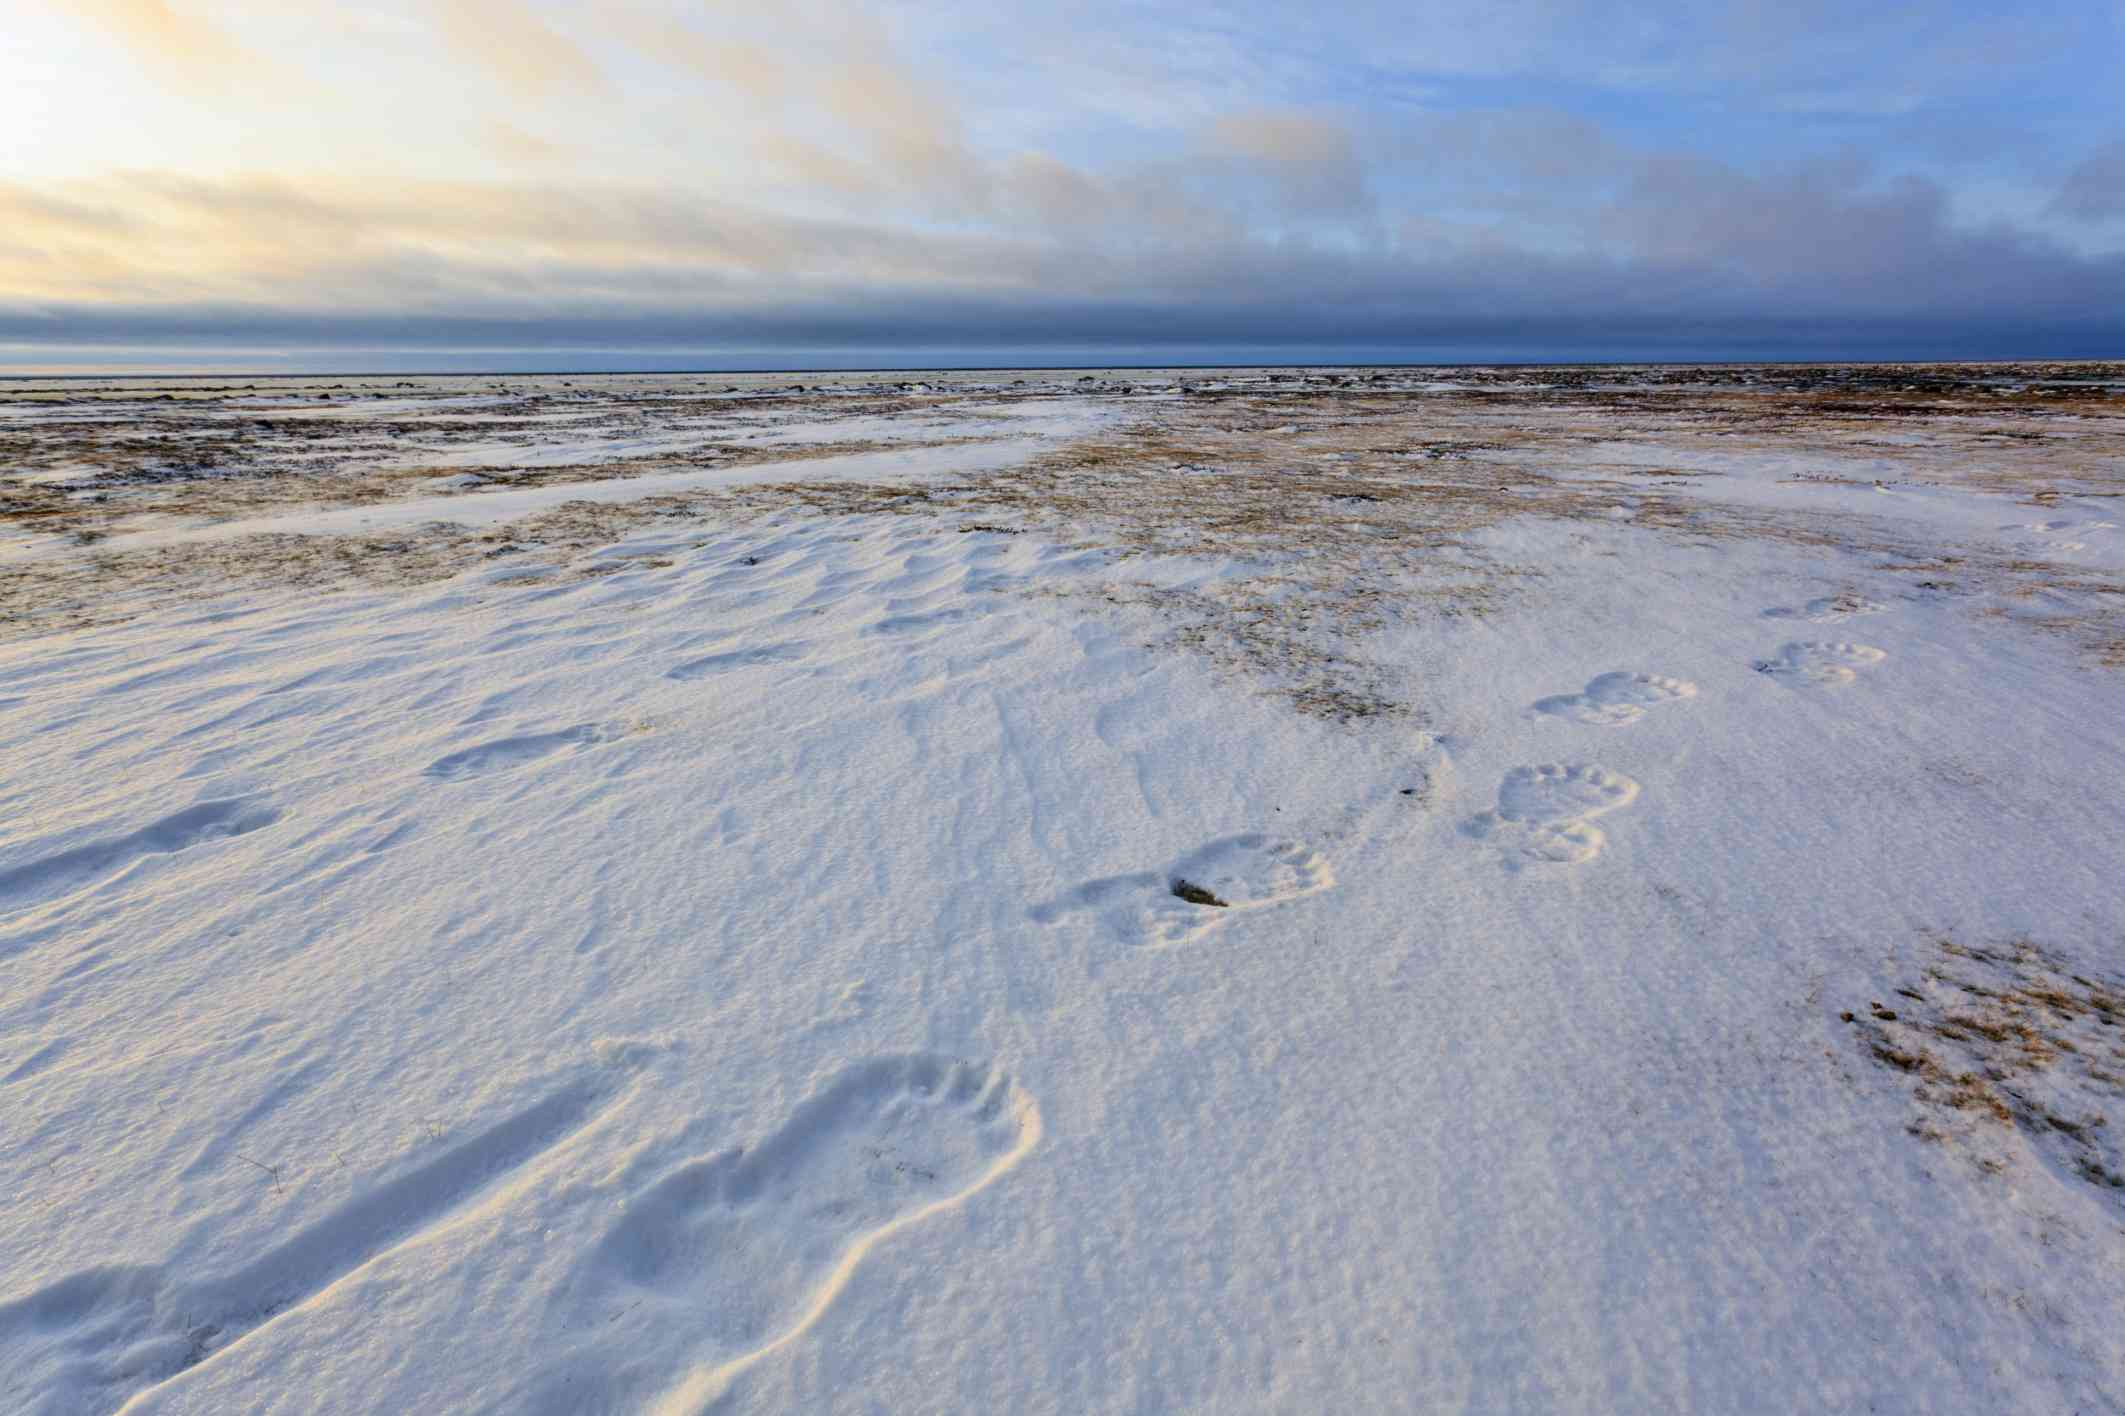 Polar bear tracks in the snow-covered interiors of Canada and Alaska, where continental polar air forms